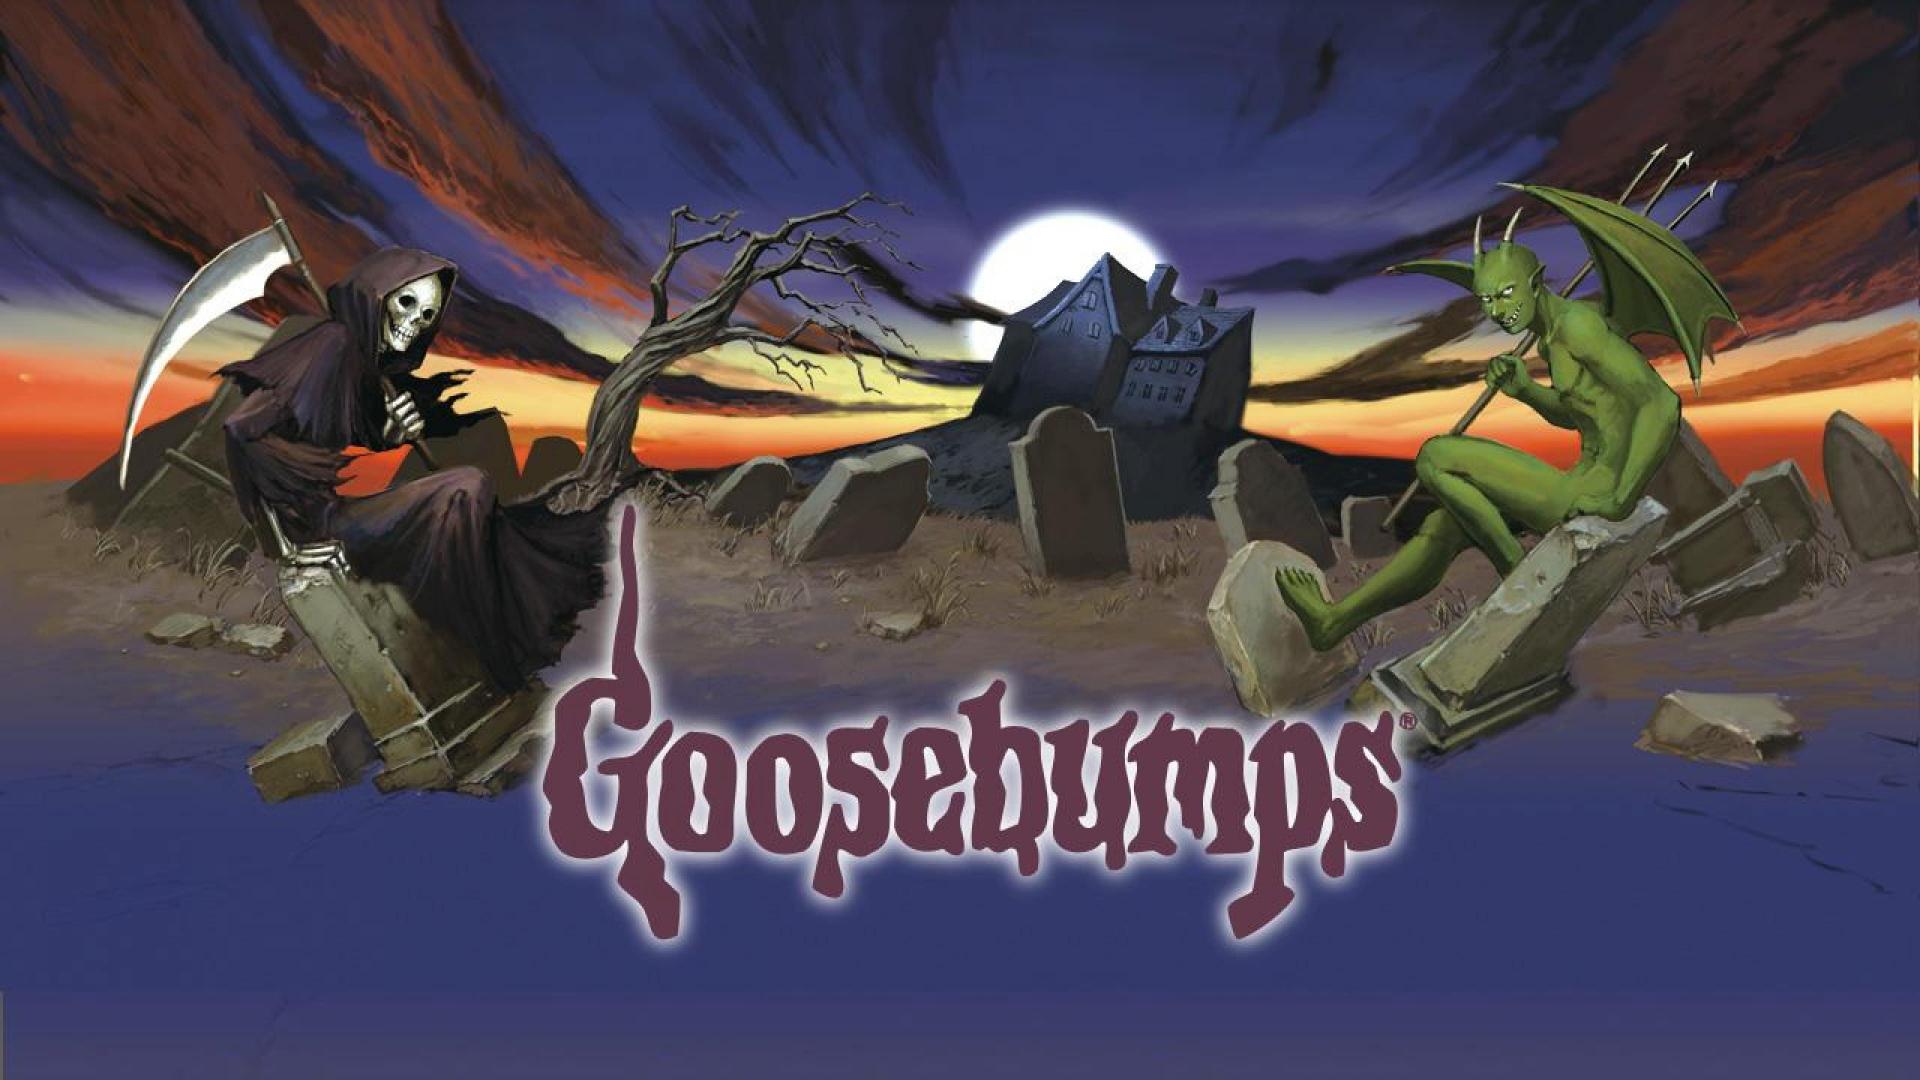 Goosebumps Wallpaper 3840x2160 Download Resolutions Desktop 1920x1080